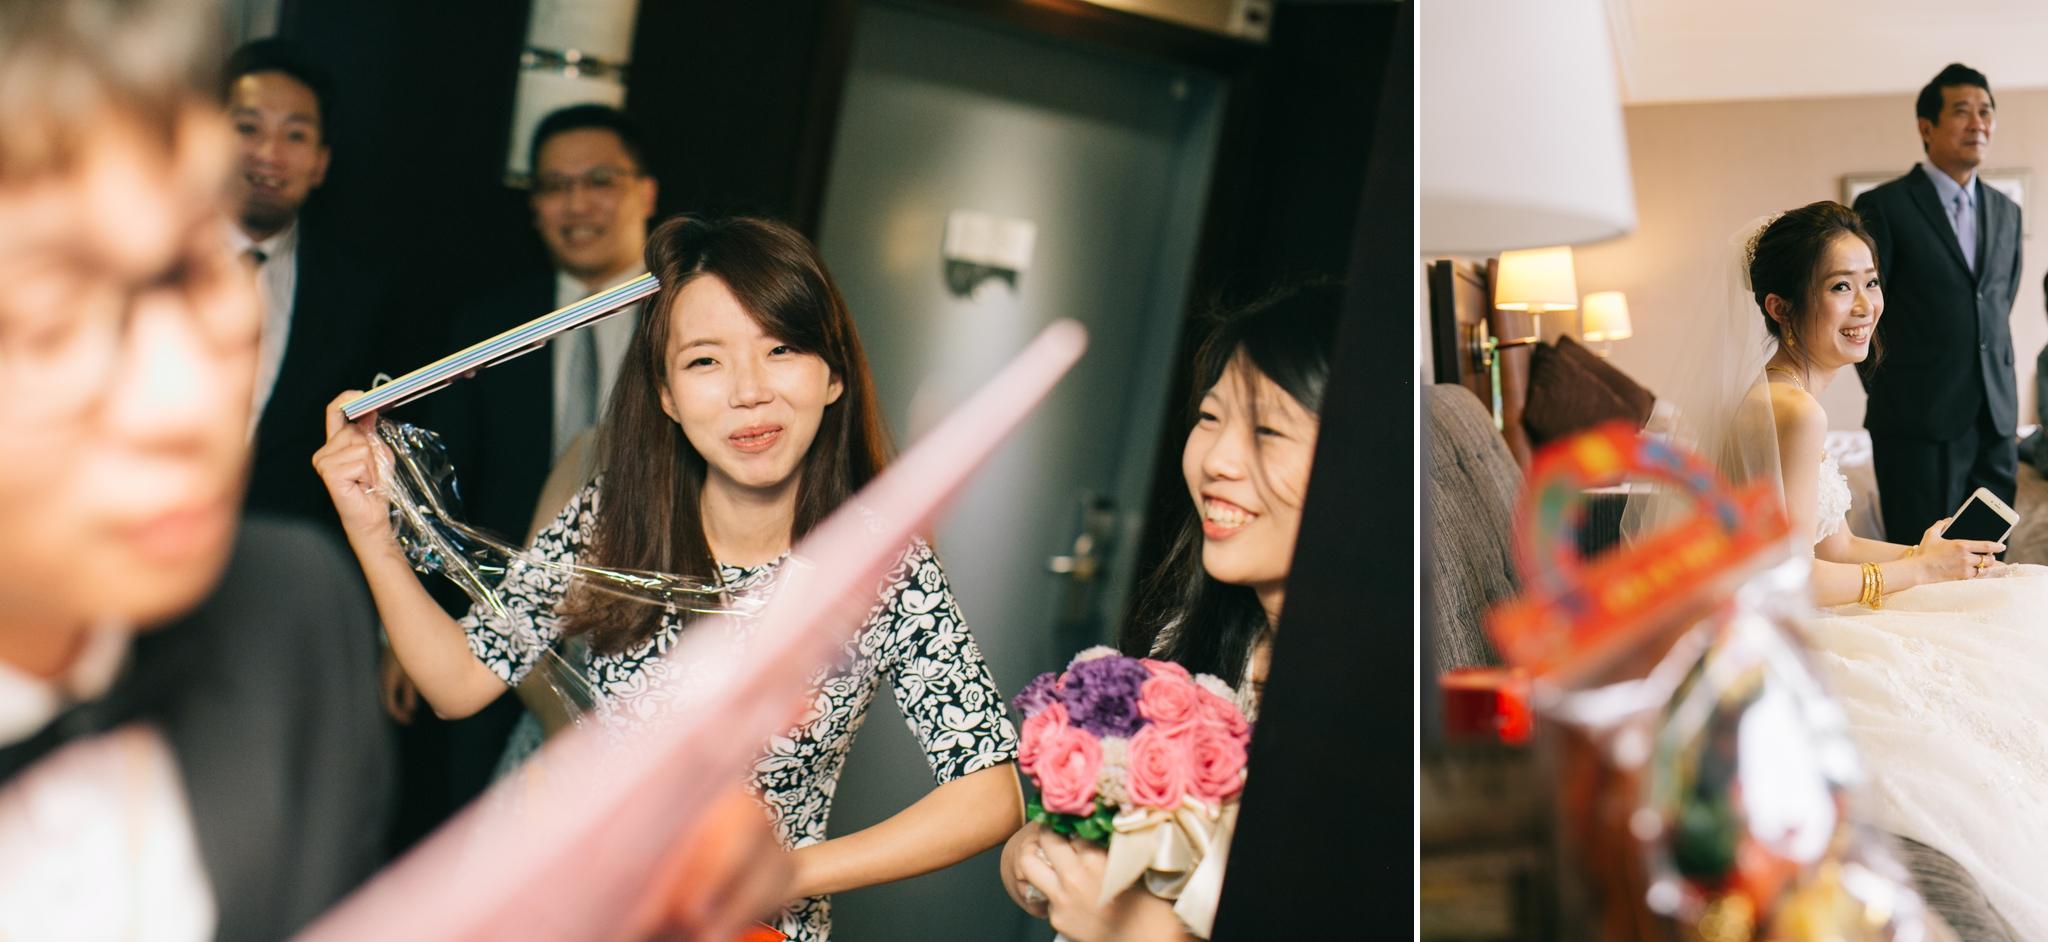 Tina+Nash-wedding-台北婚禮迎娶晚宴-新莊終身大事-051.jpg